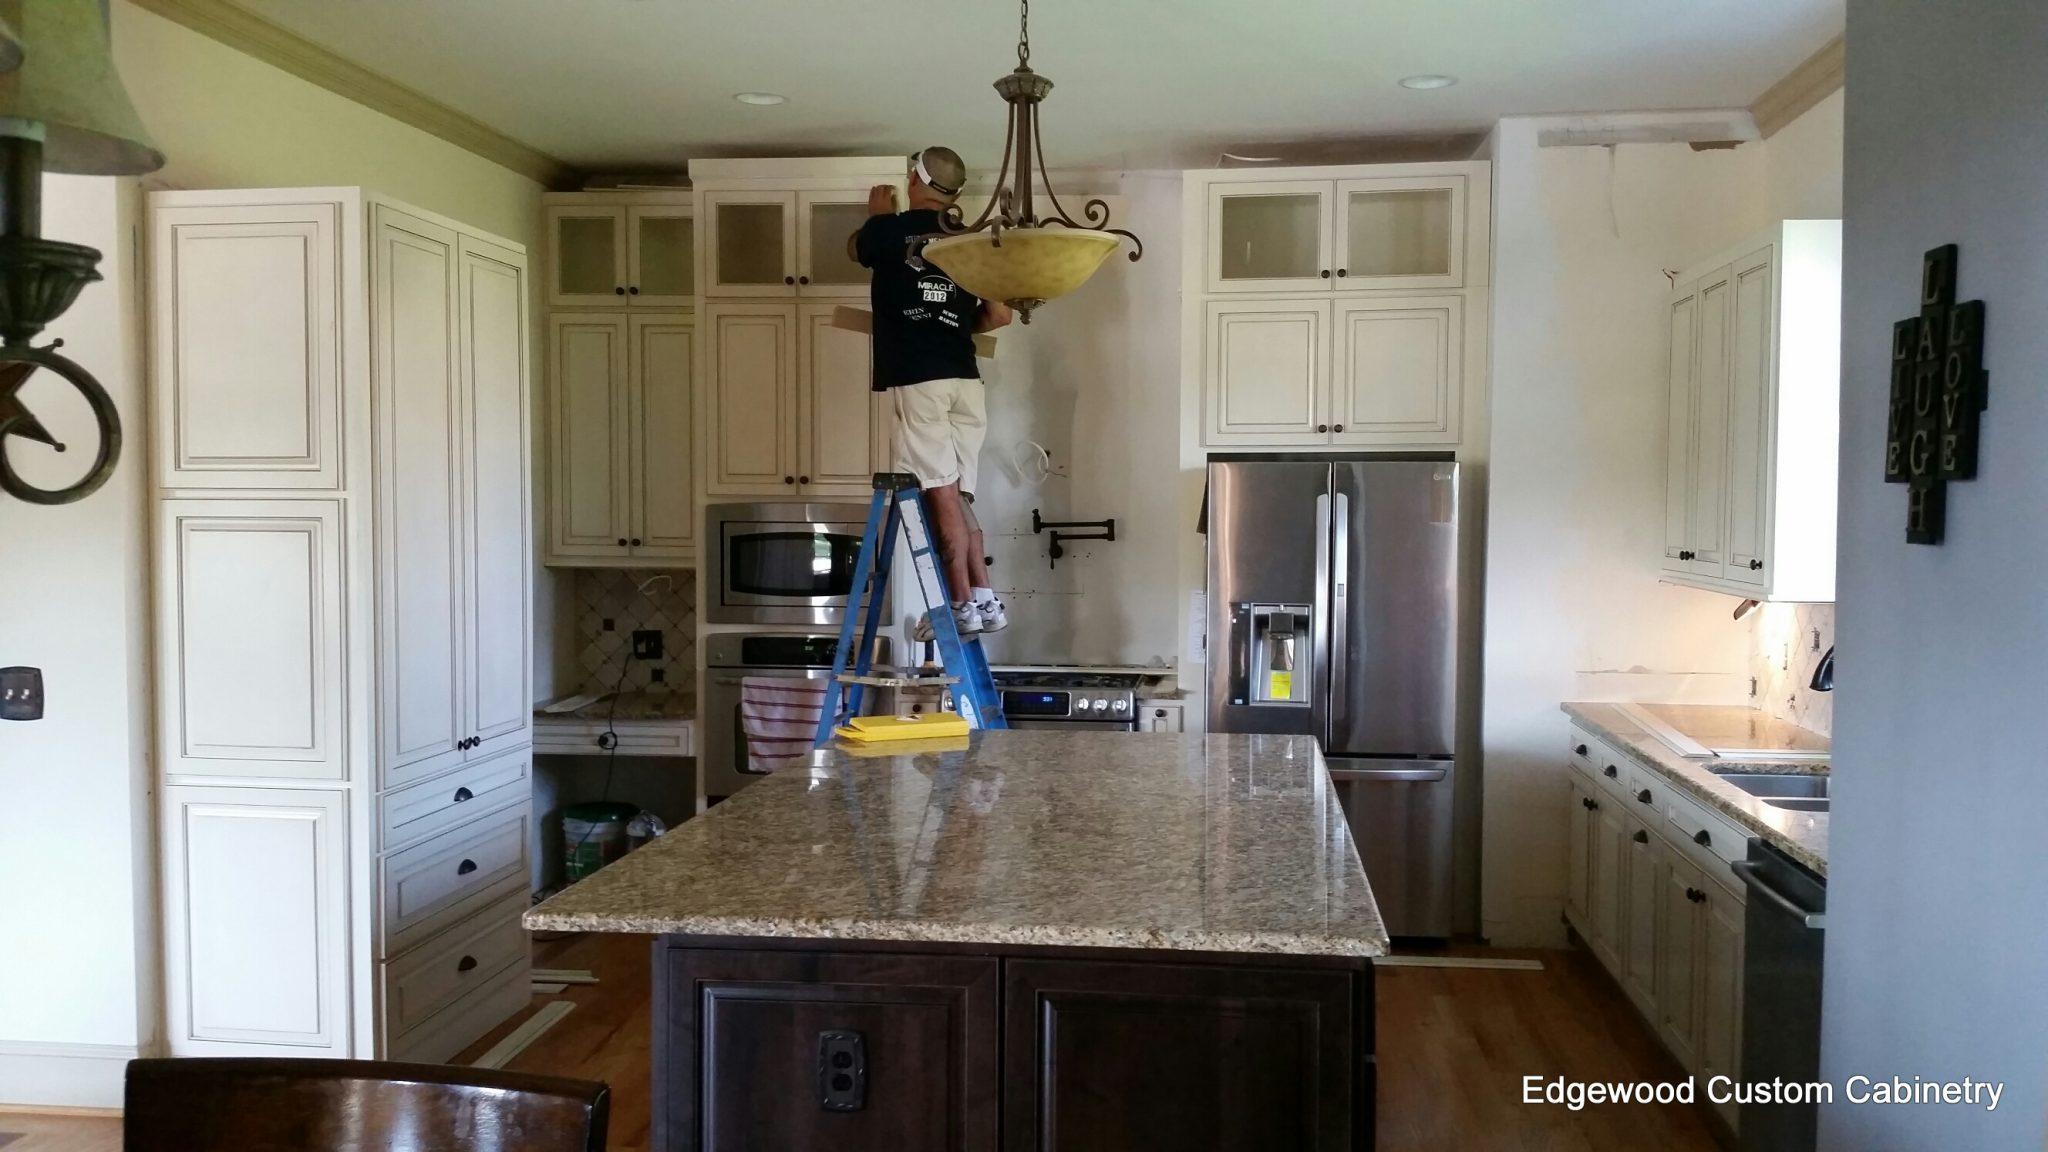 custom cabinets edgewood cabinetry